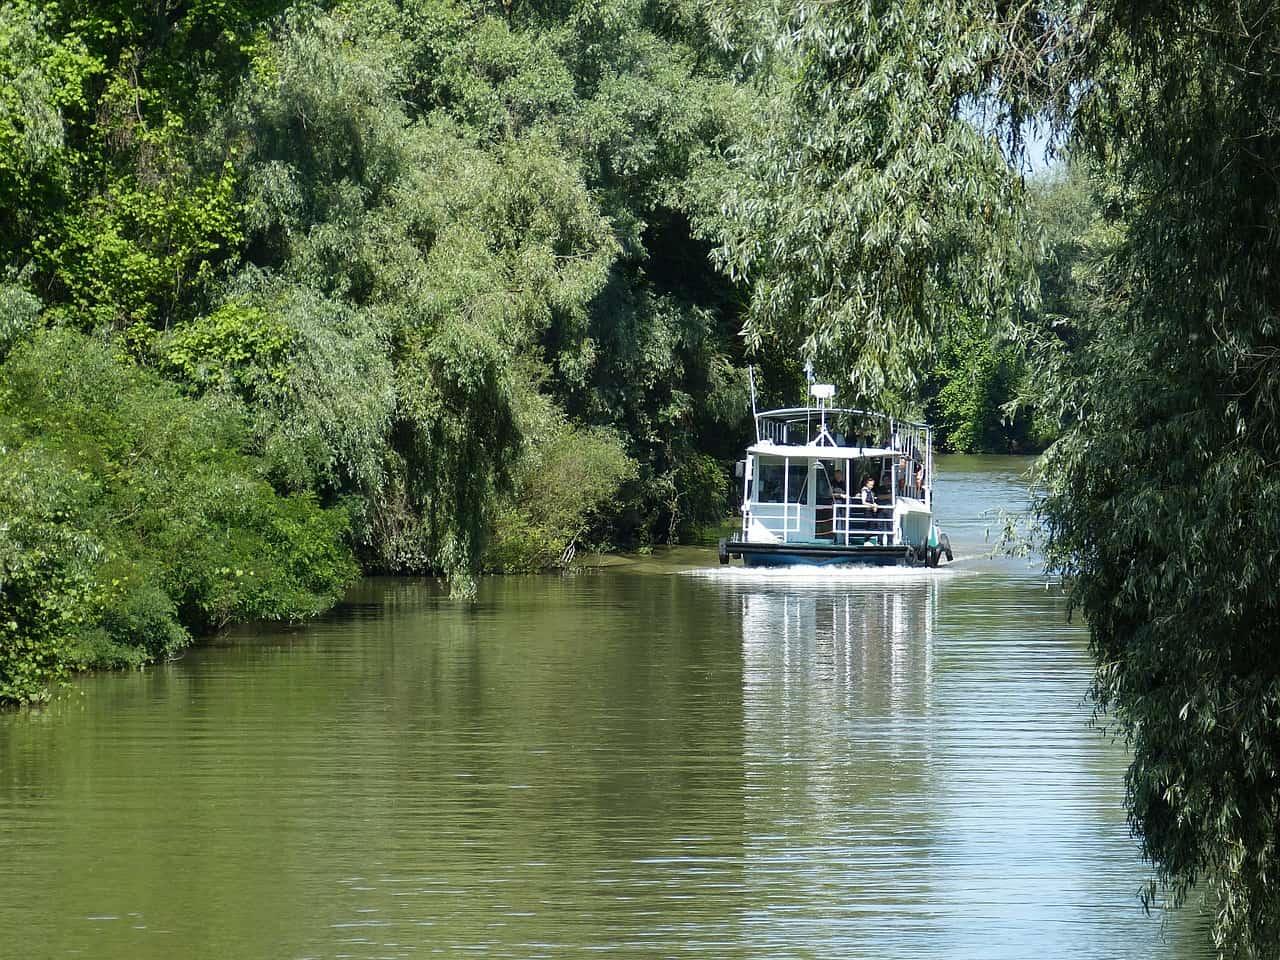 Flusskreuzfahrten